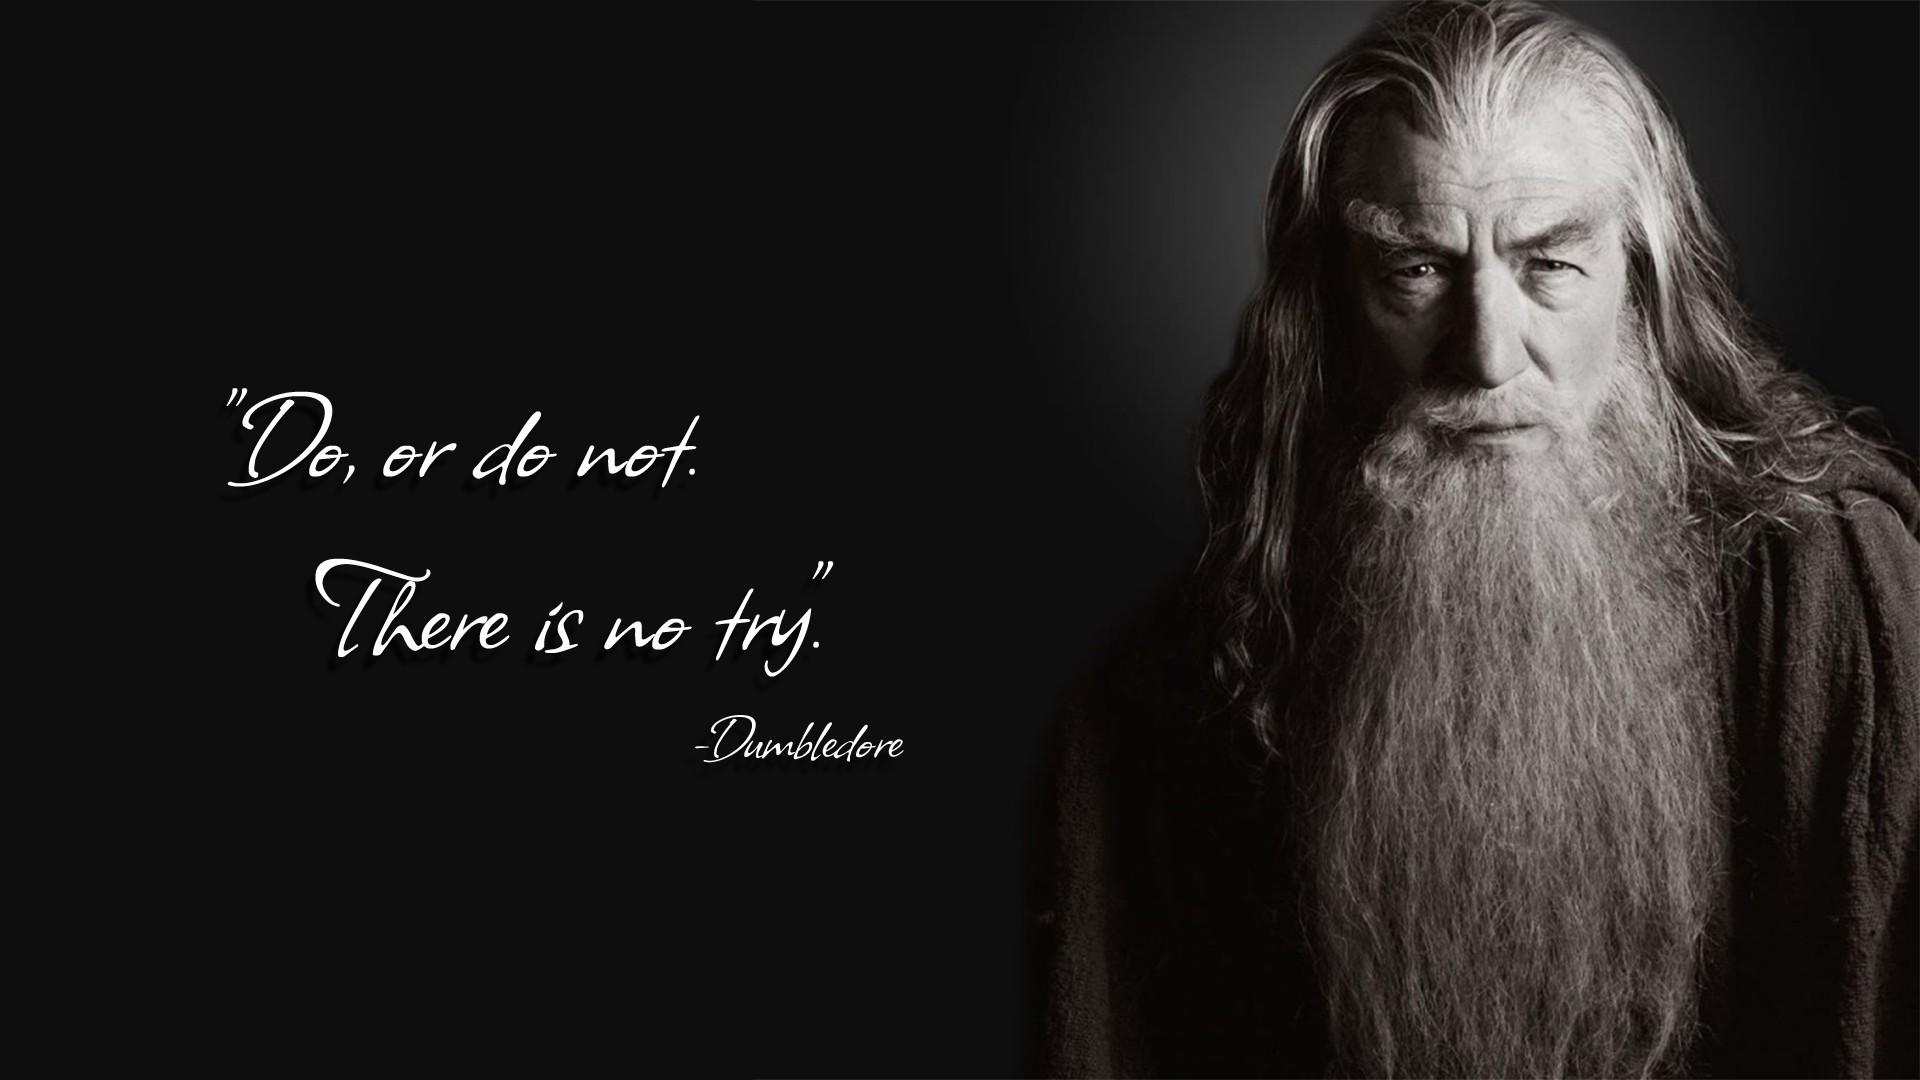 Most Inspiring Wallpaper Harry Potter Black And White - quote-monochrome-Harry-Potter-Yoda-Gandalf-Ian-McKellen-Albus-Dumbledore-darkness-black-and-white-monochrome-photography-album-cover-255294  Snapshot_334012.jpg